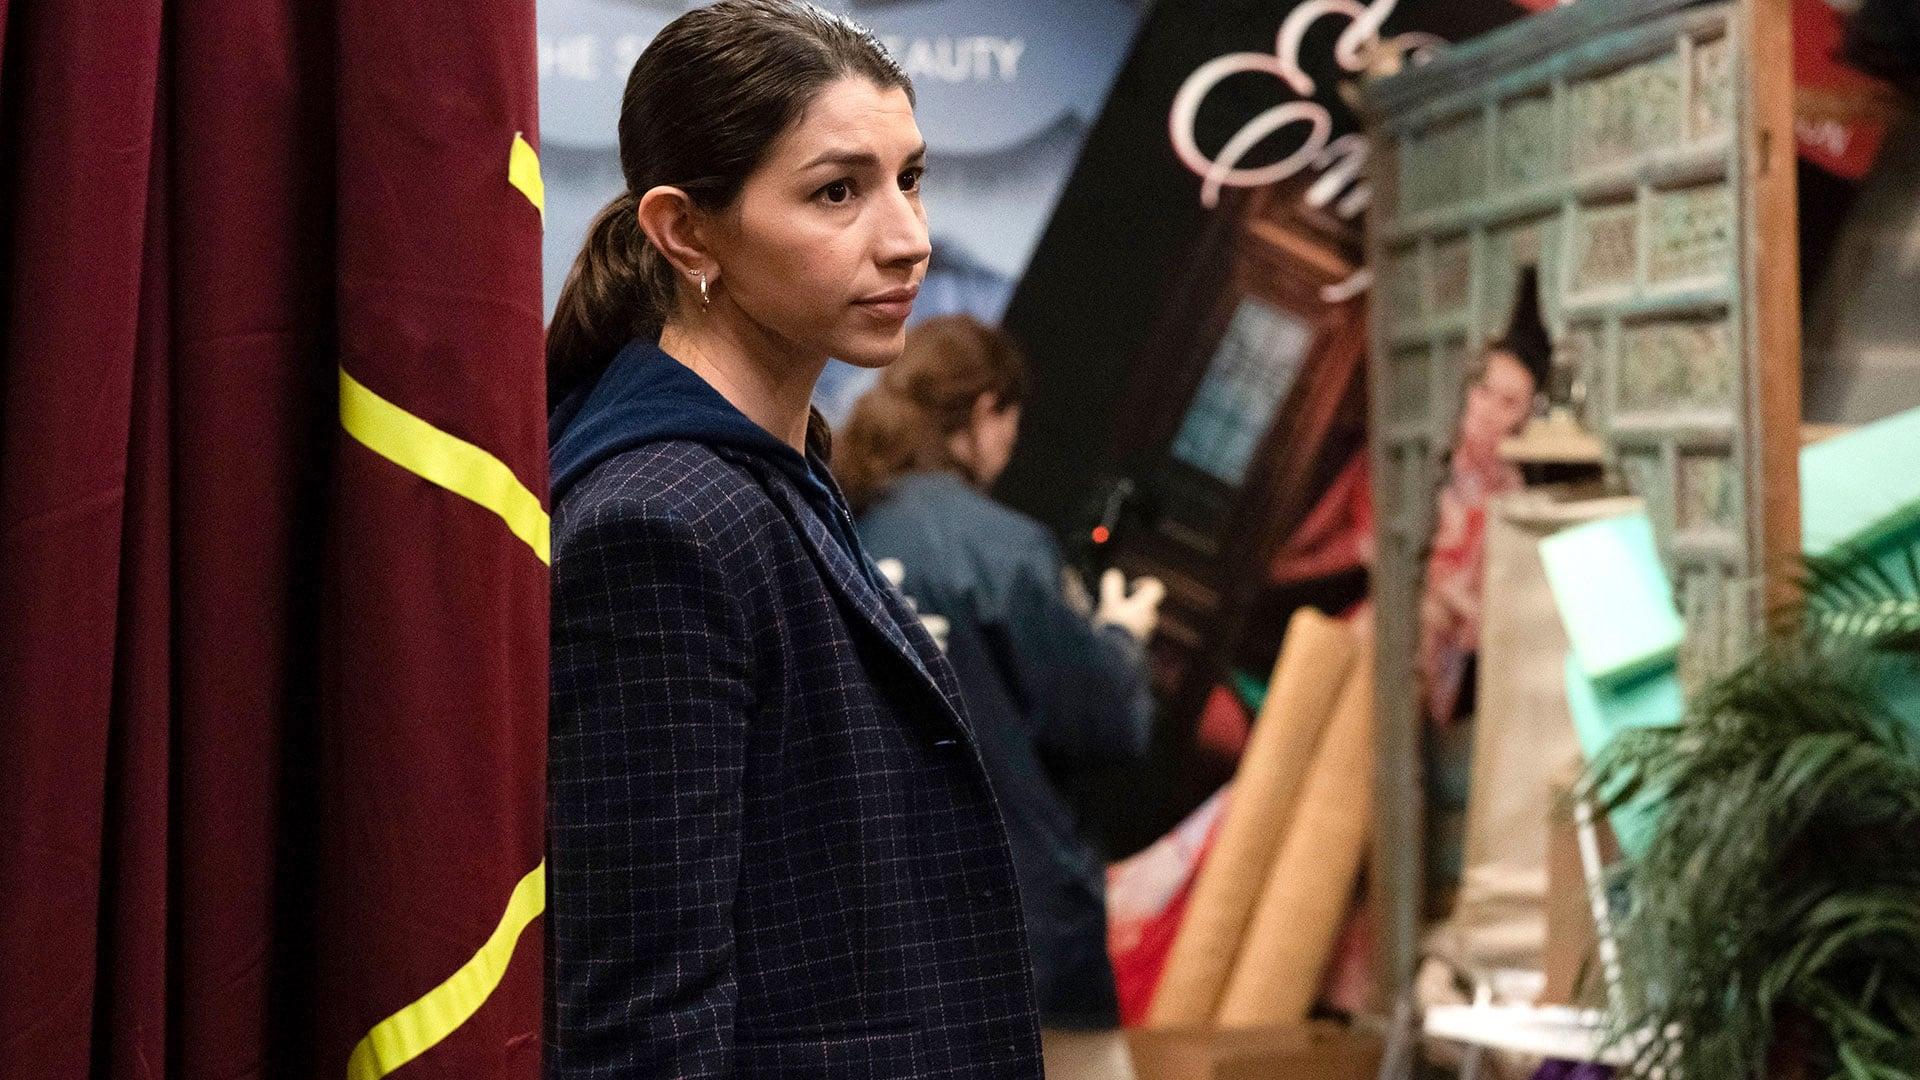 Law & Order: Special Victims Unit Season 21 :Episode 17  DANCE, LIES AND VIDEOTAPE